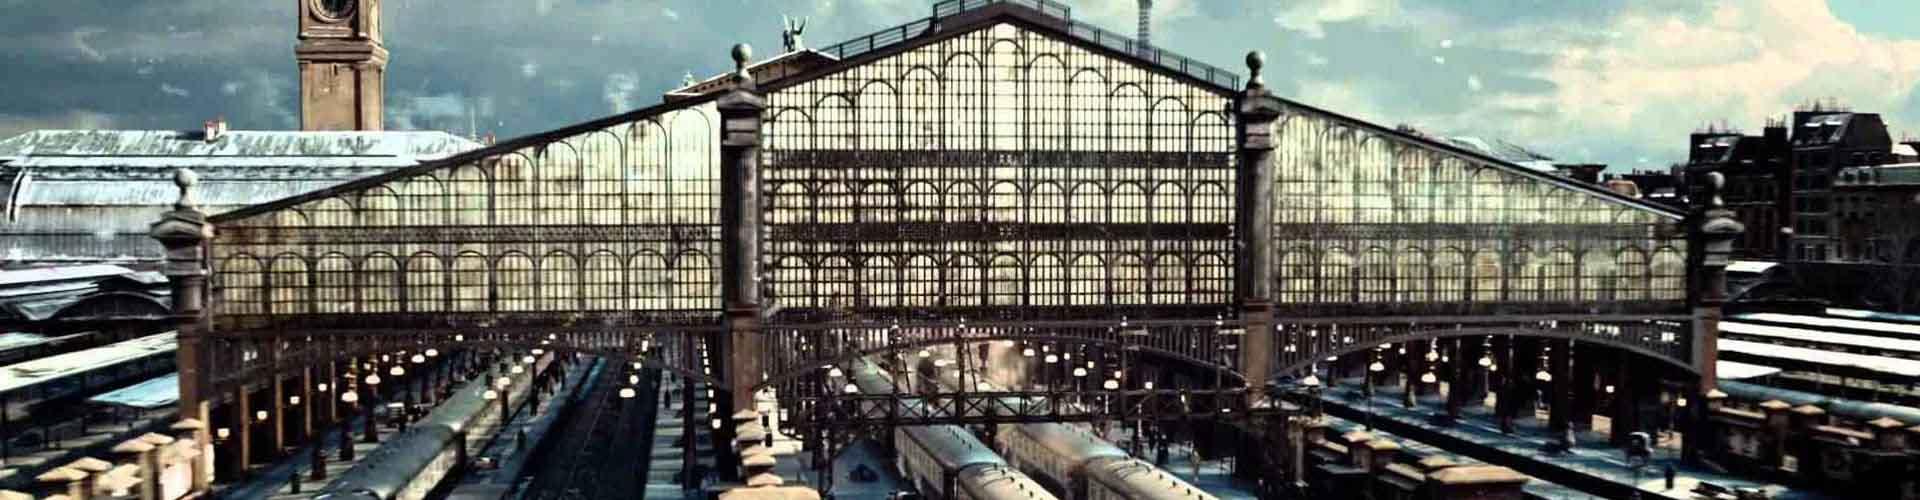 París - Apartamentos cerca a Estación de tren de Montparnasse. Mapas de París, Fotos y comentarios de cada Apartamento en París.